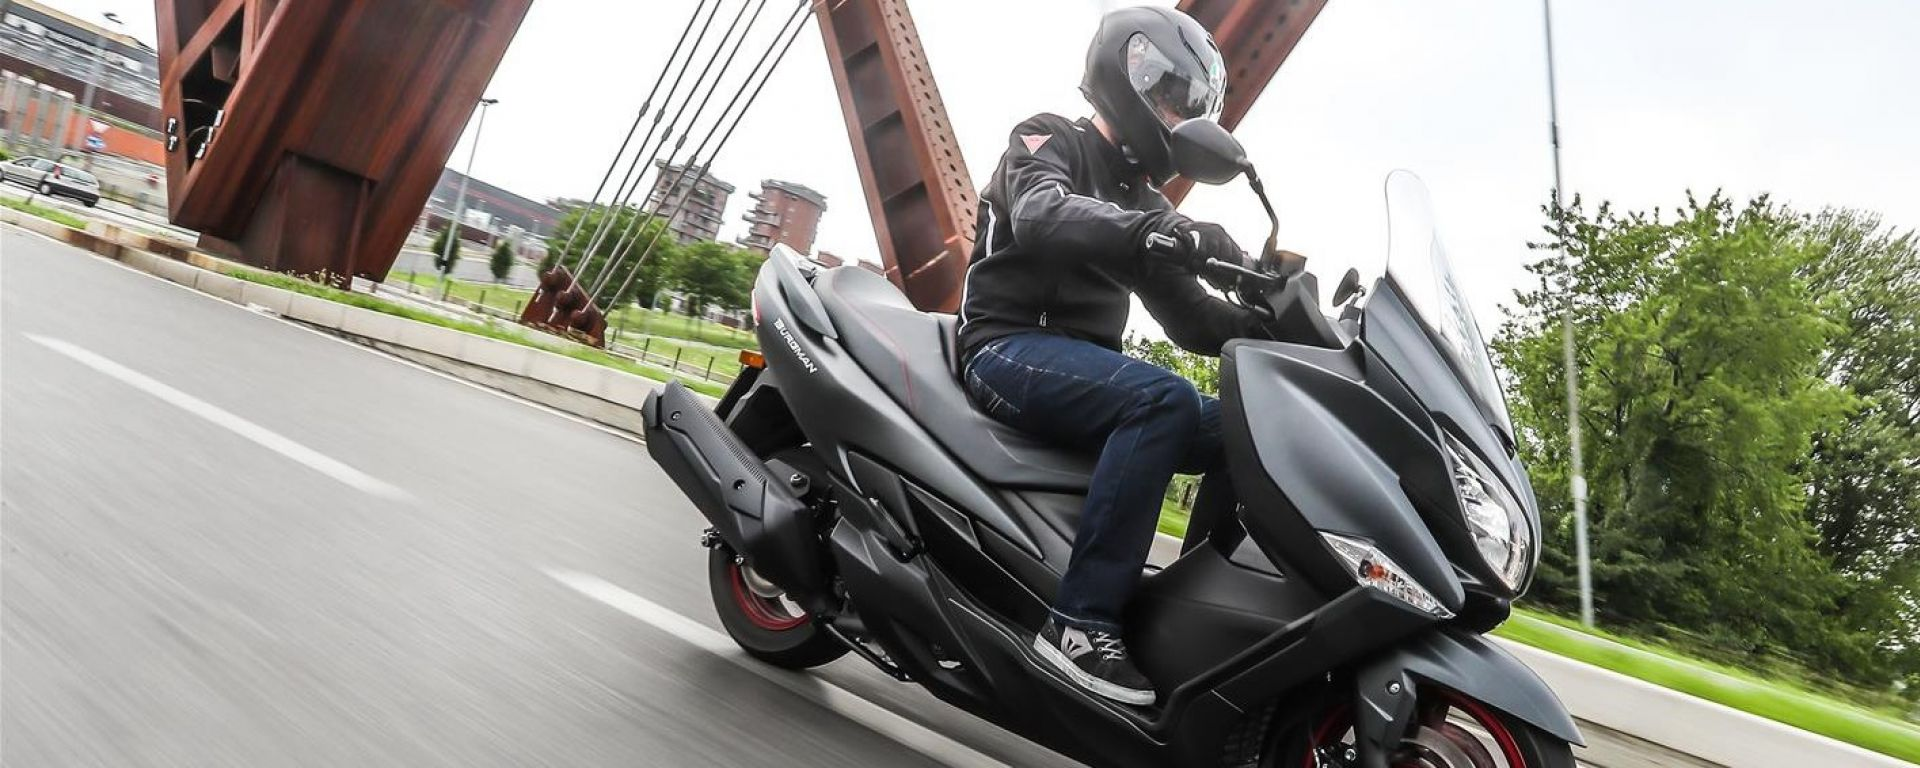 Suzuki Demoride Tour 2017